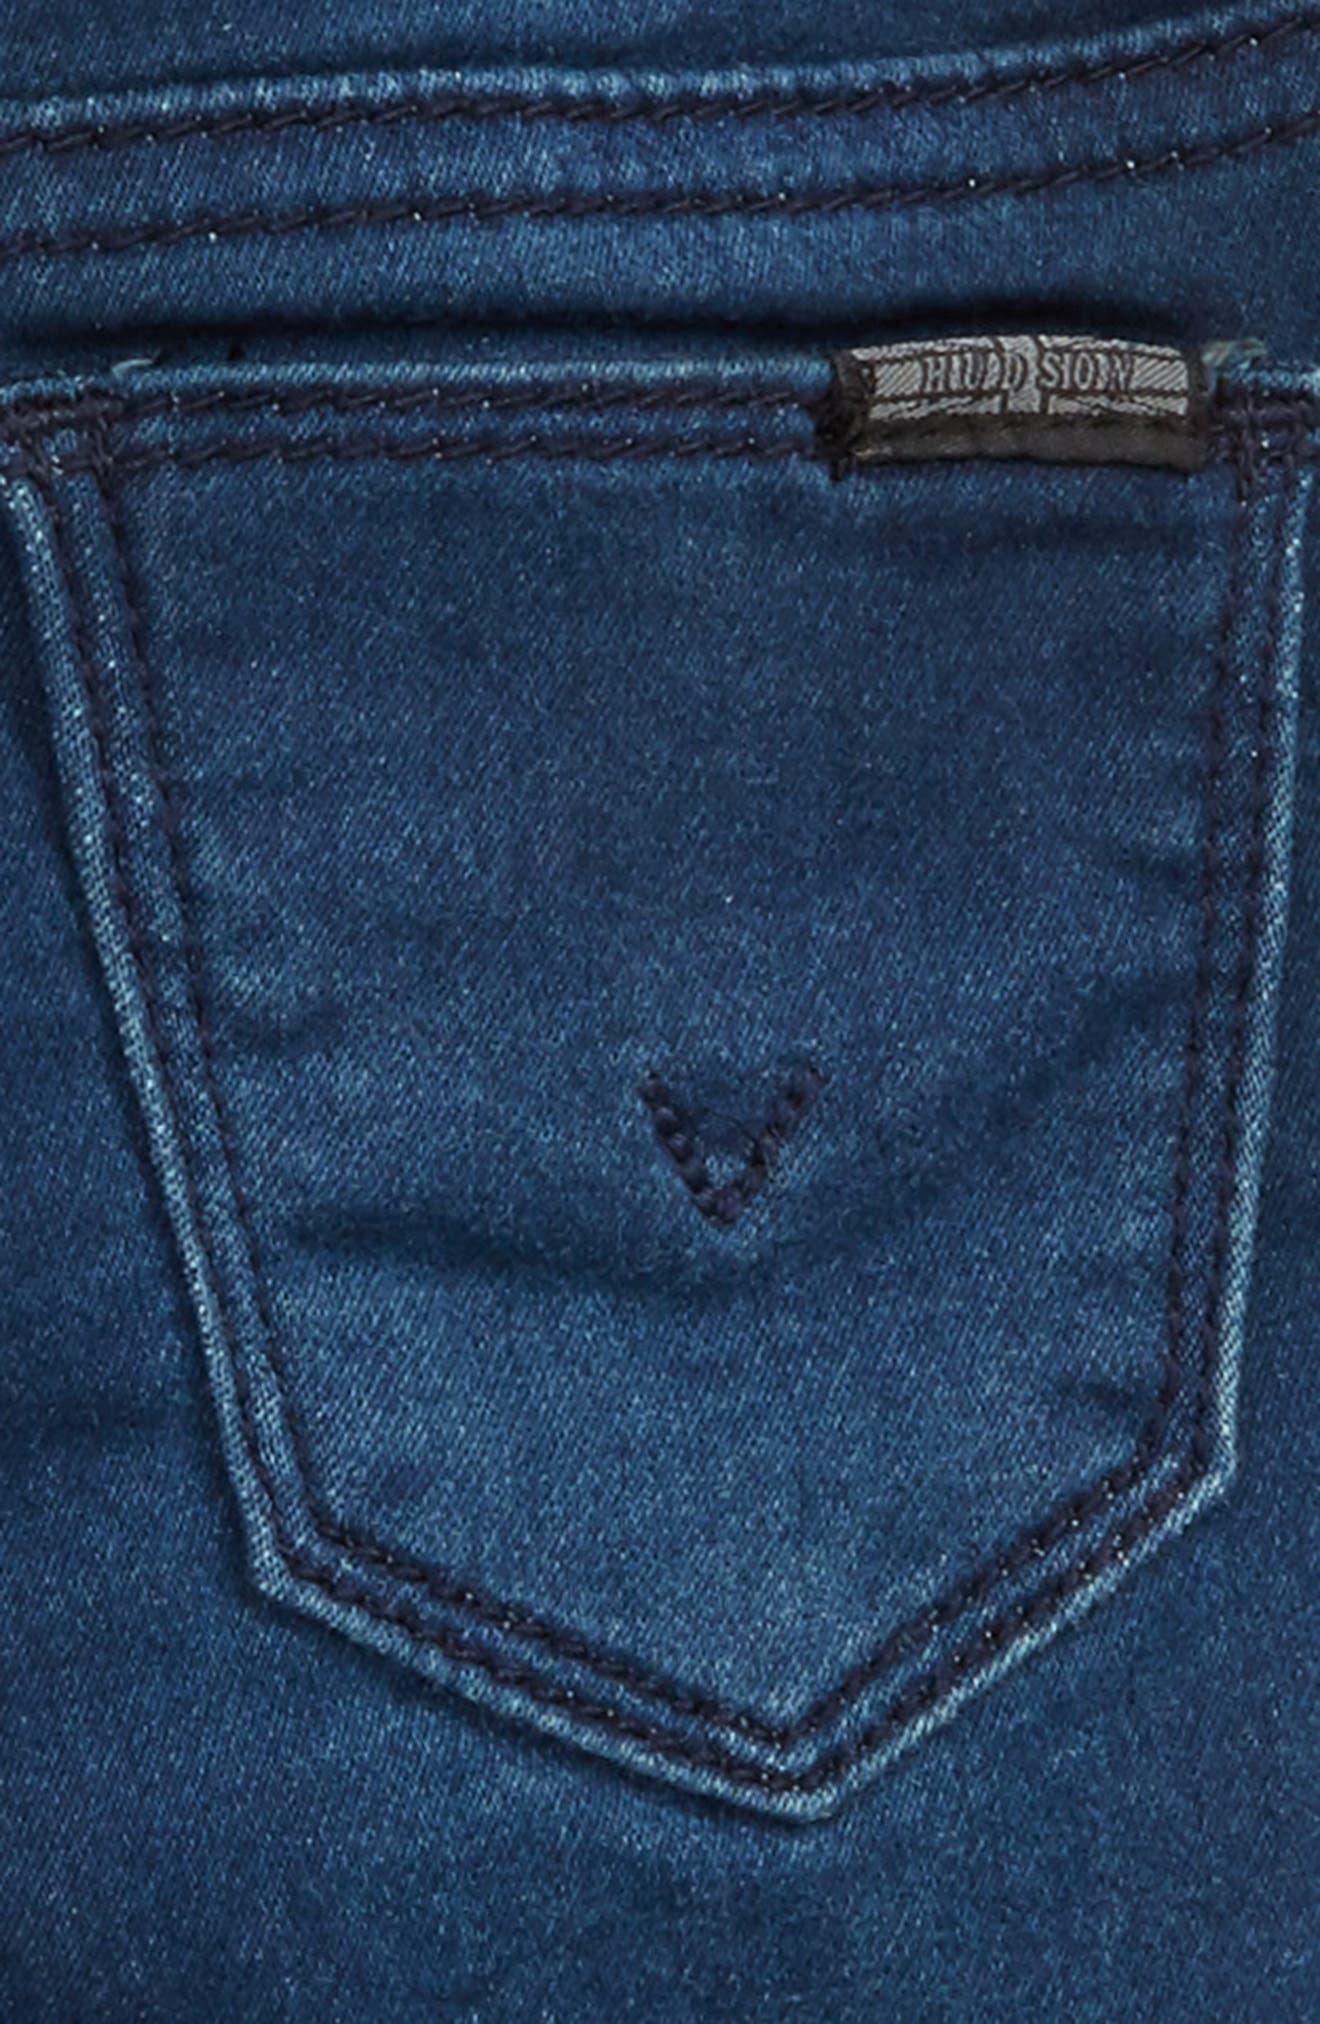 Moto Skinny Jeans,                             Alternate thumbnail 3, color,                             476